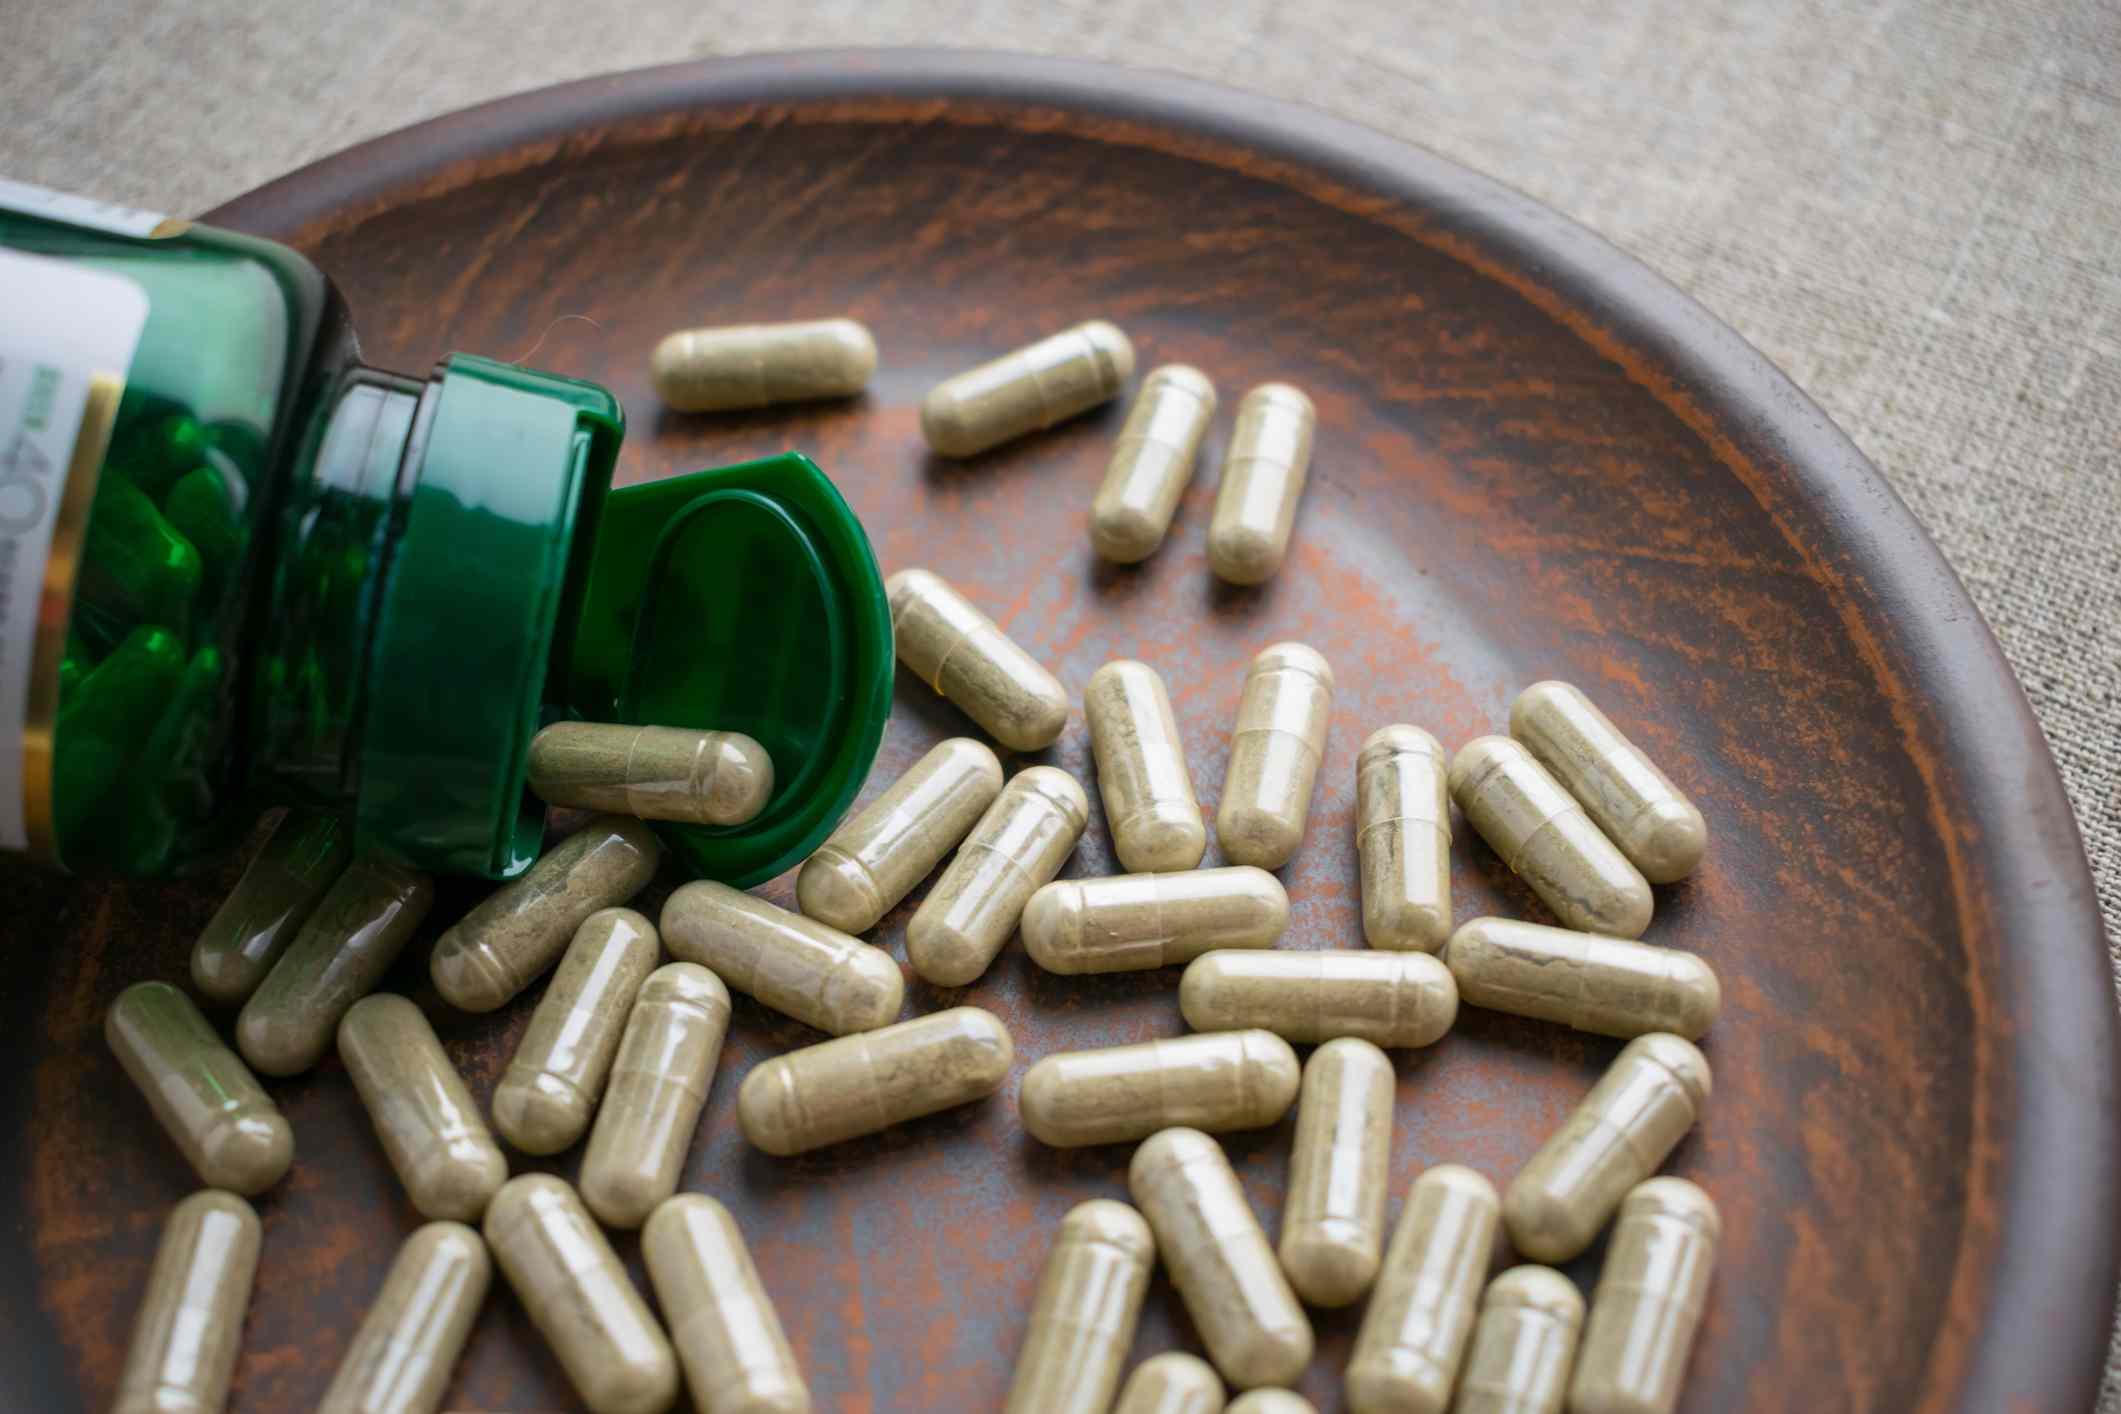 Close up of a biotin bottle spilling pills